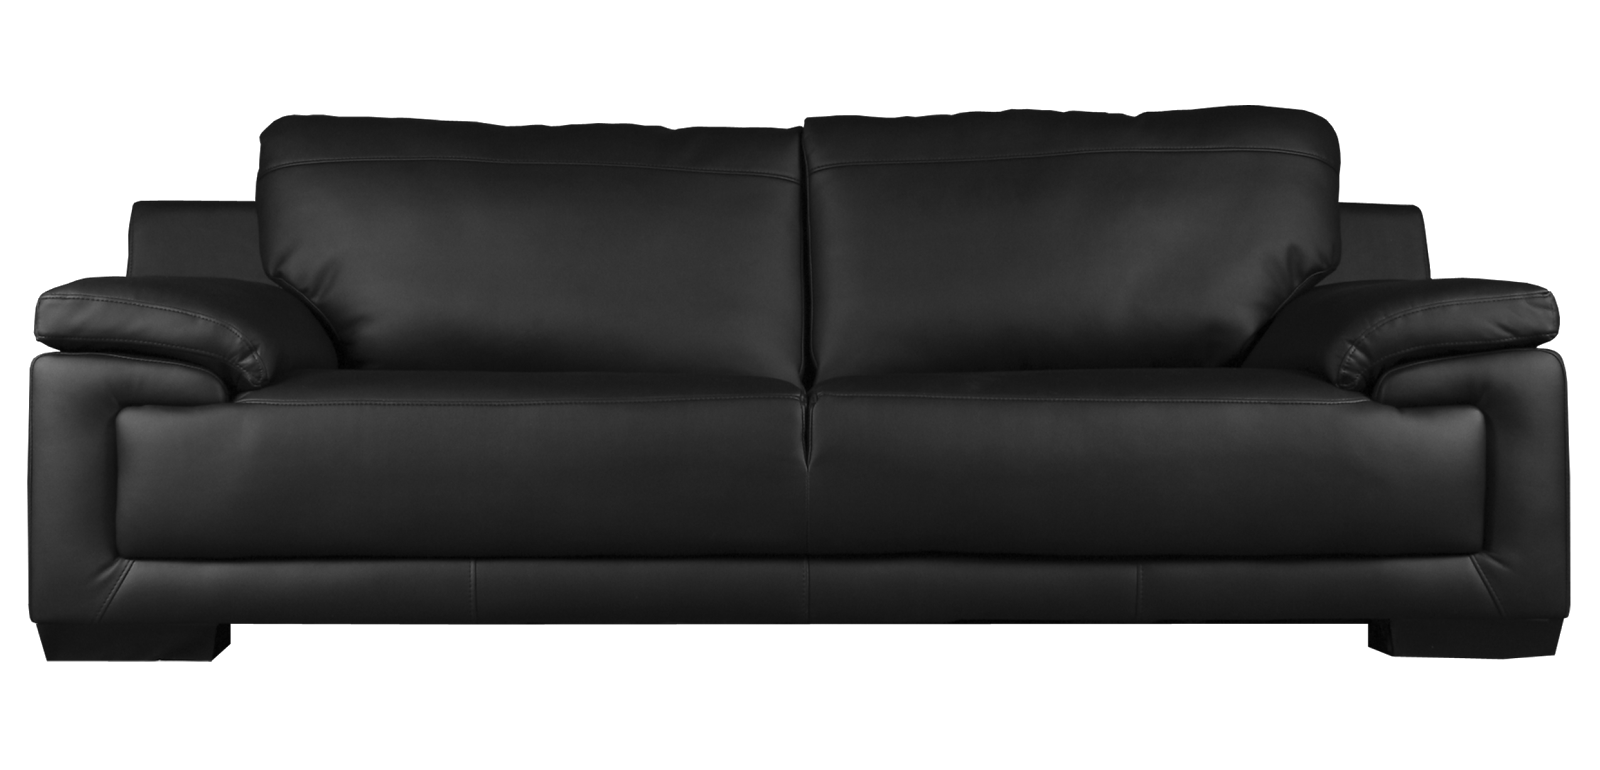 Black Sofa Png Image - Sofa, Transparent background PNG HD thumbnail